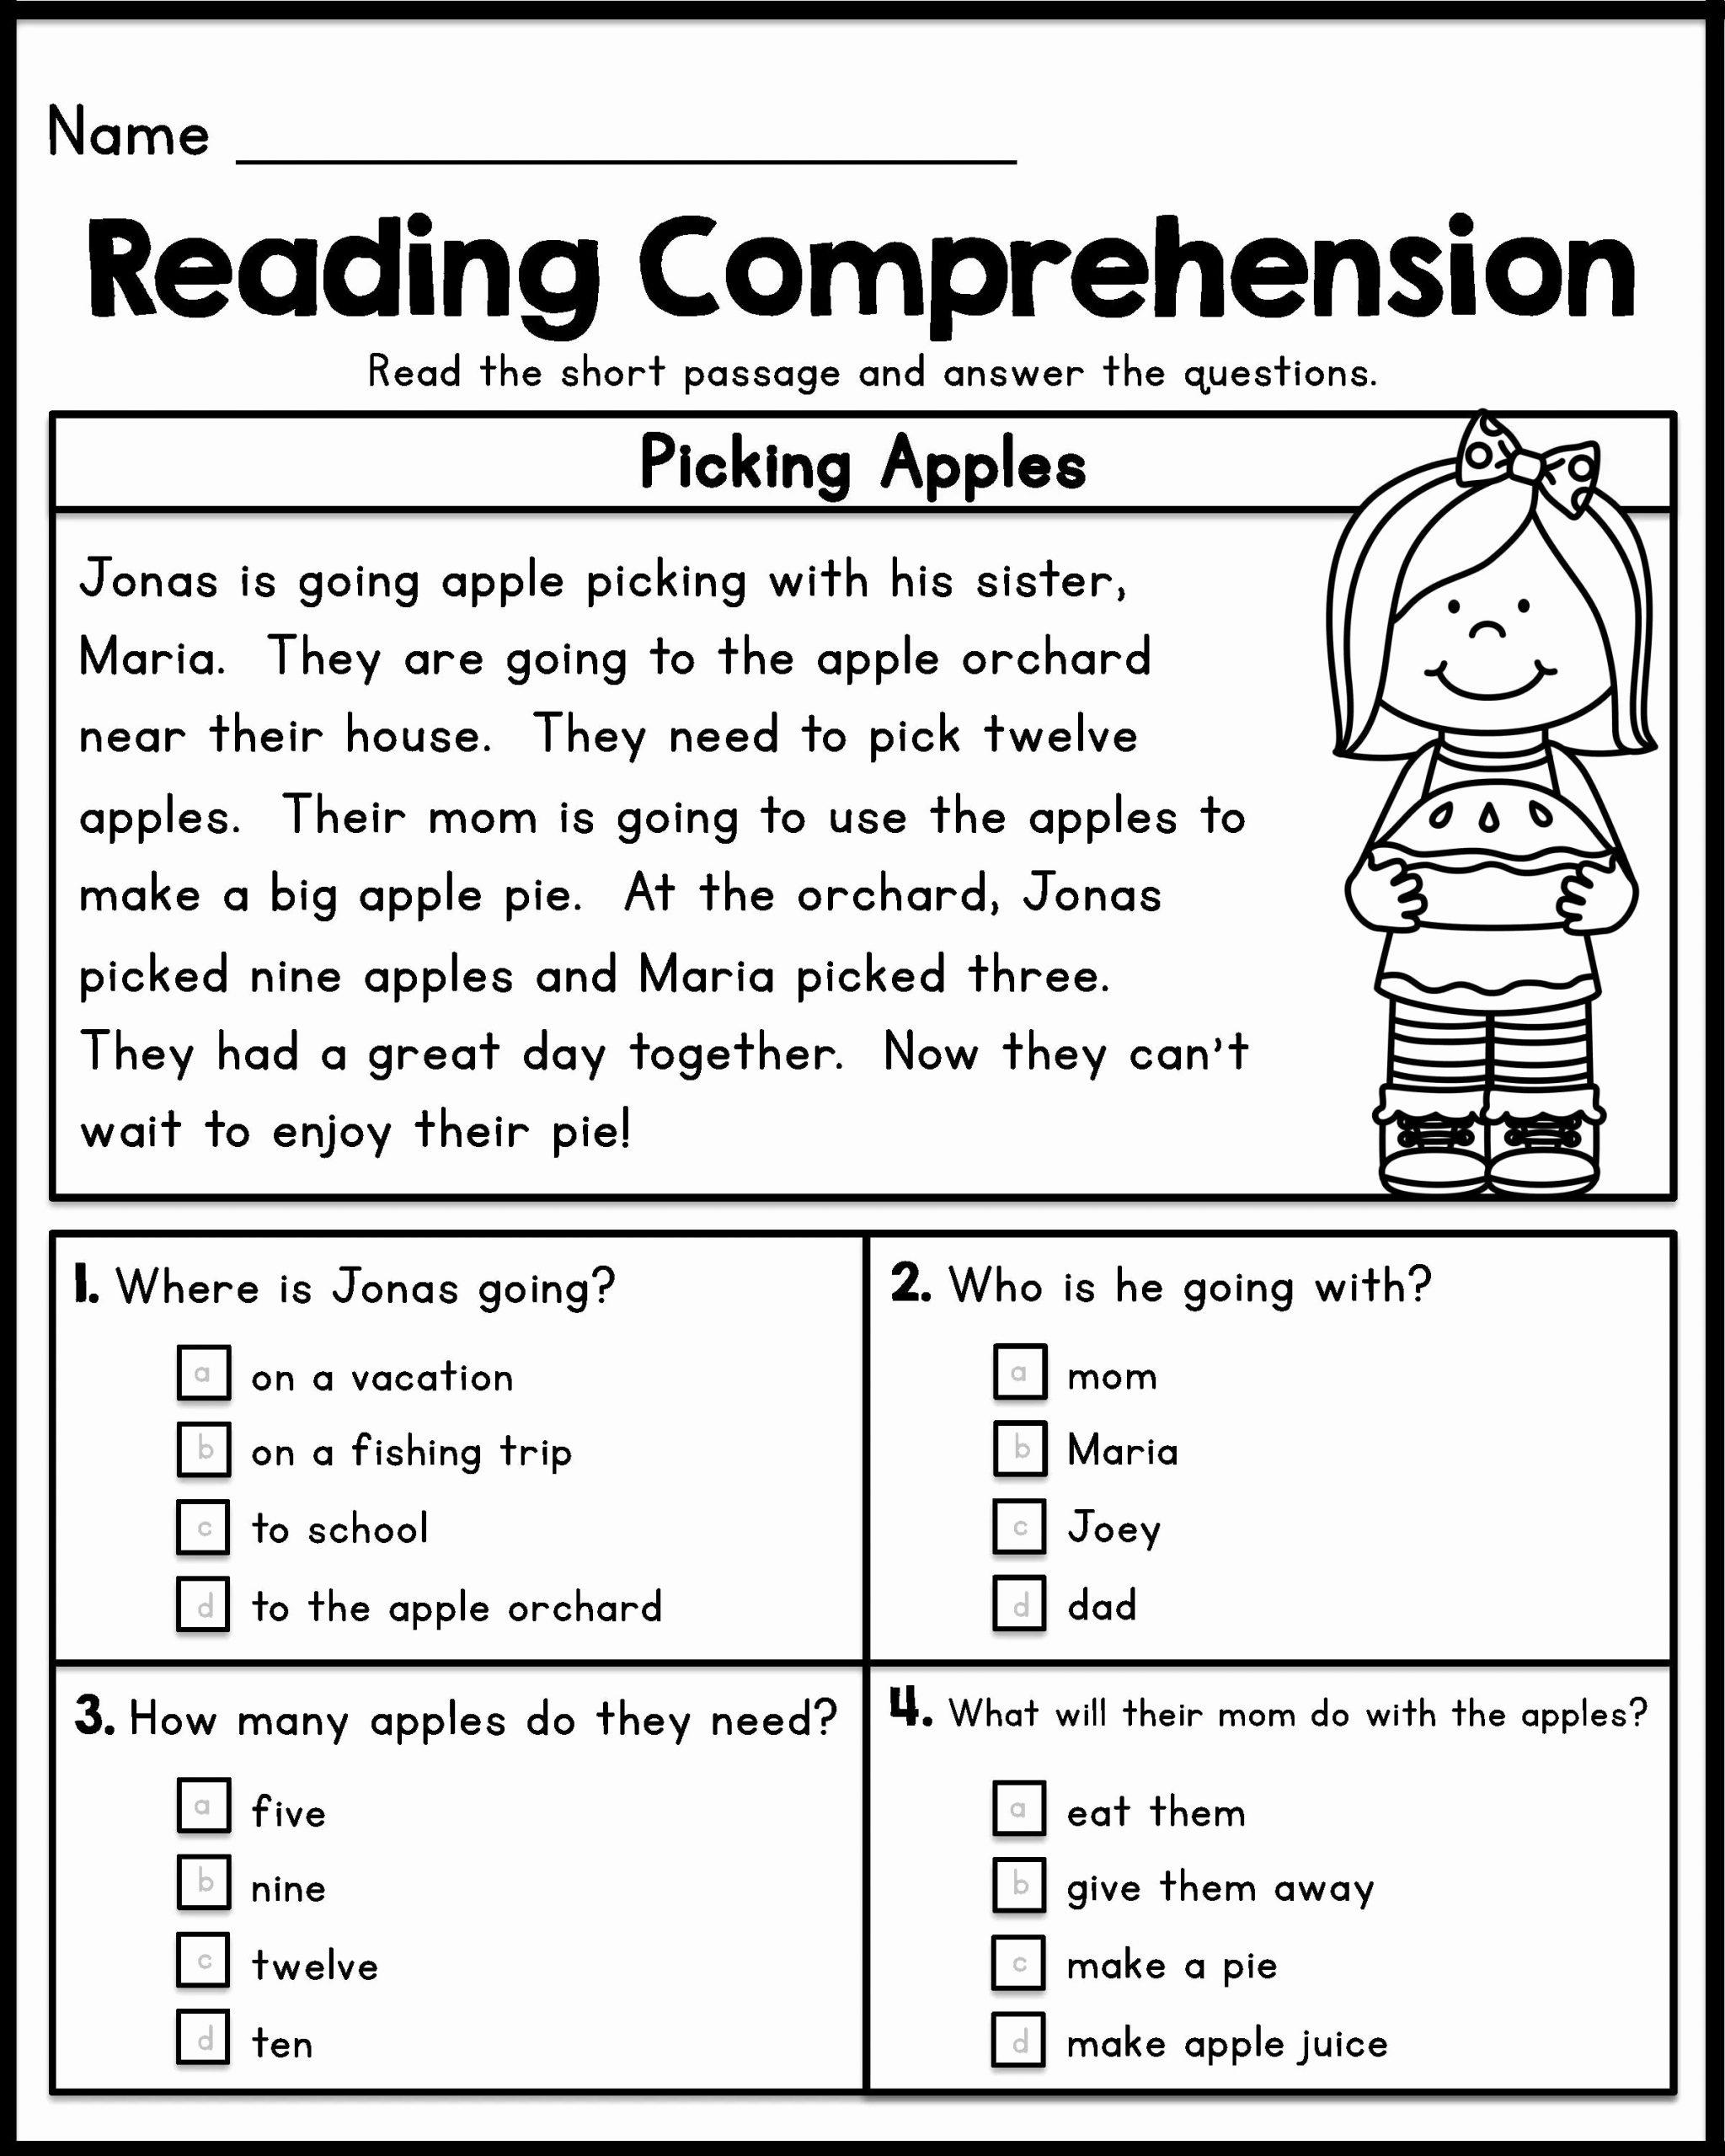 1st Grade Reading Worksheets Pdf Fresh 1st Grade Reading Prehension Worksheets Pdf for